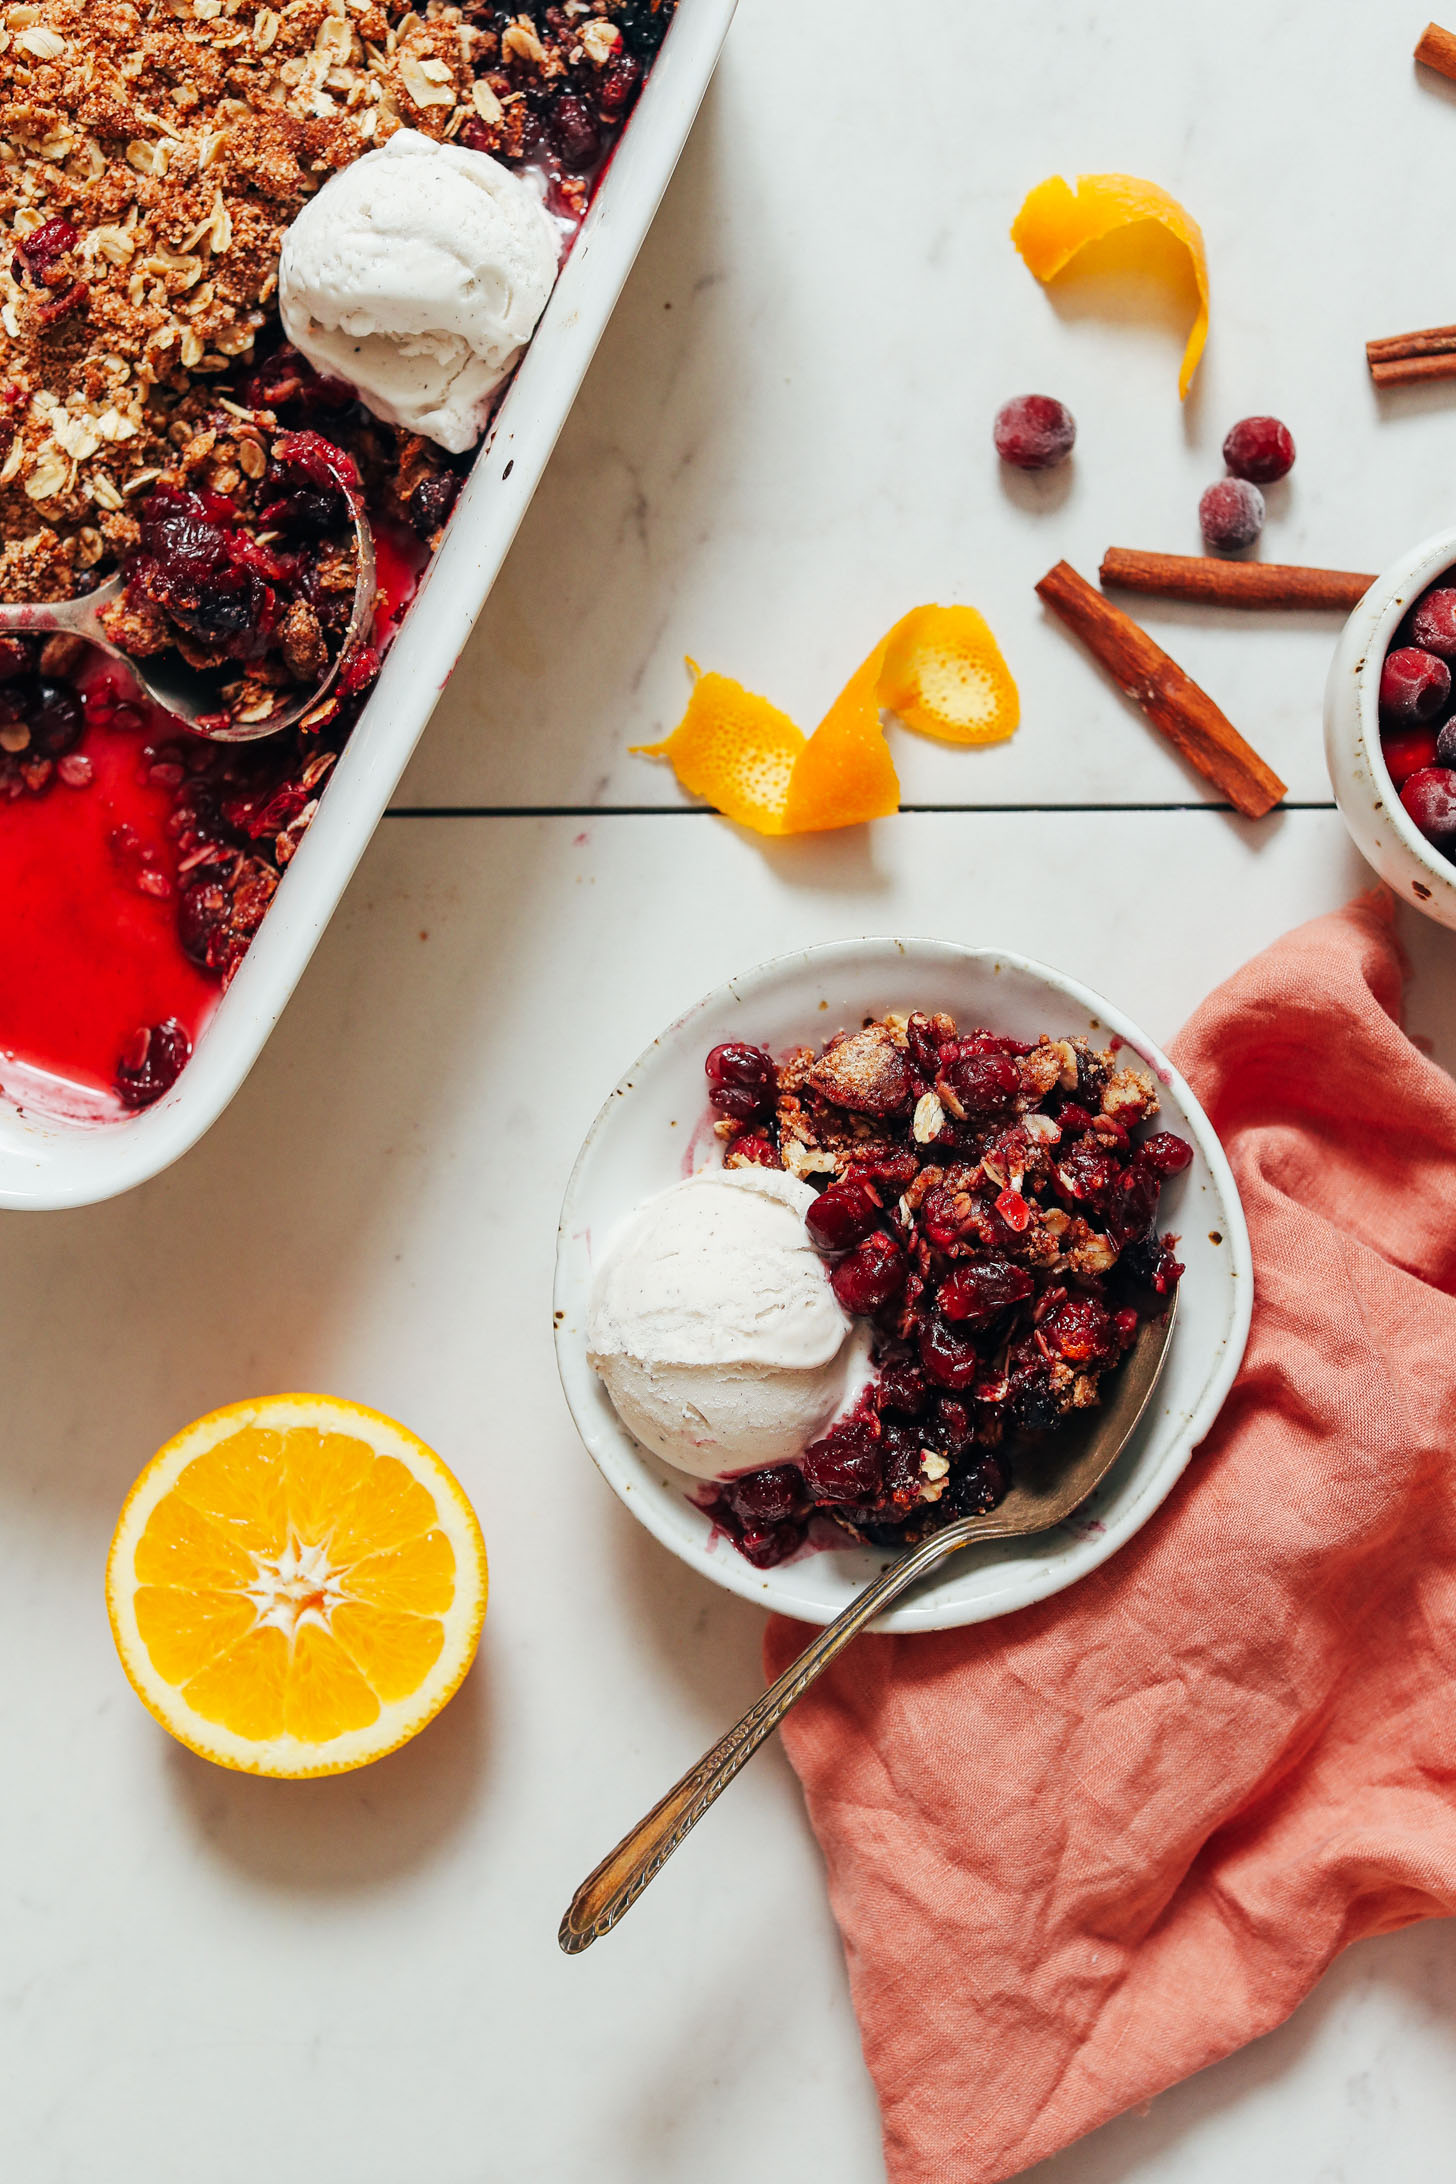 Bowl and baking dish of orange cranberry crisp with vegan vanilla ice cream